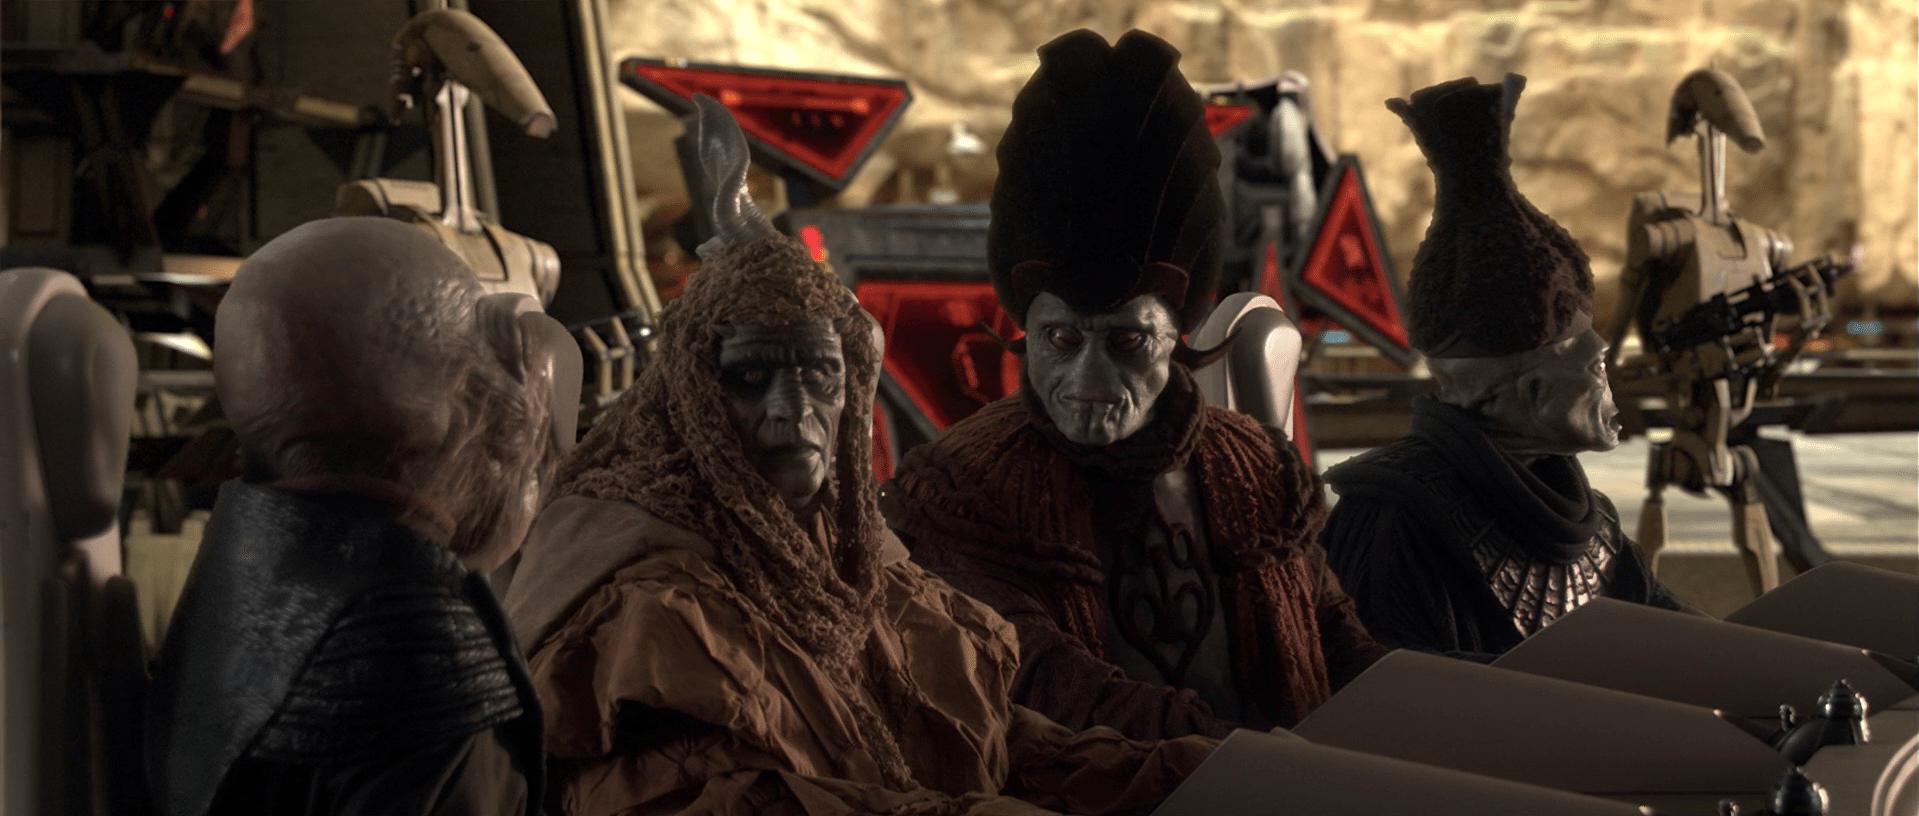 separatists- Star Wars politics